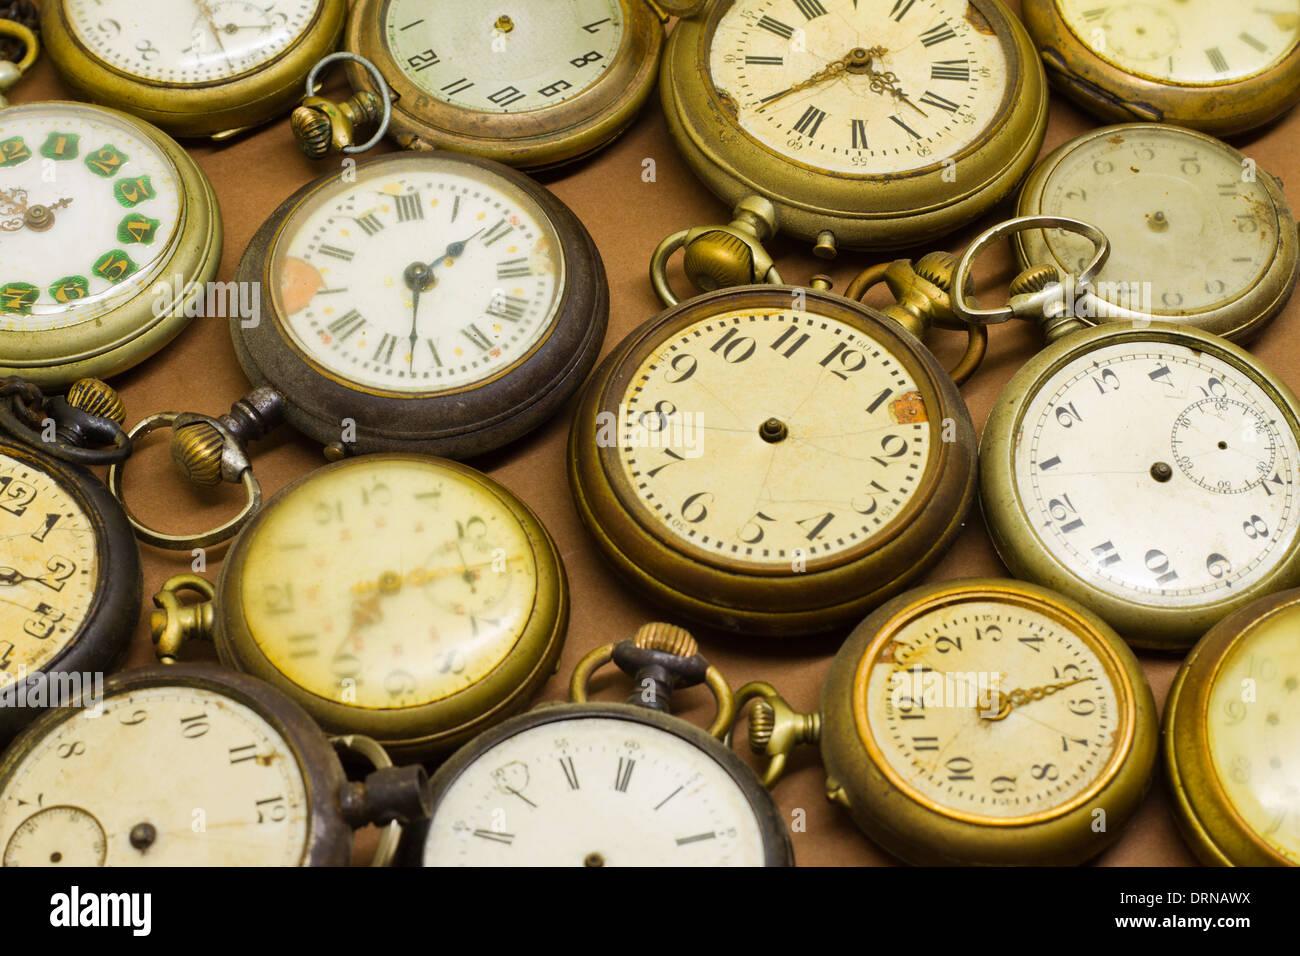 Antique broken clocks on brown background - Stock Image